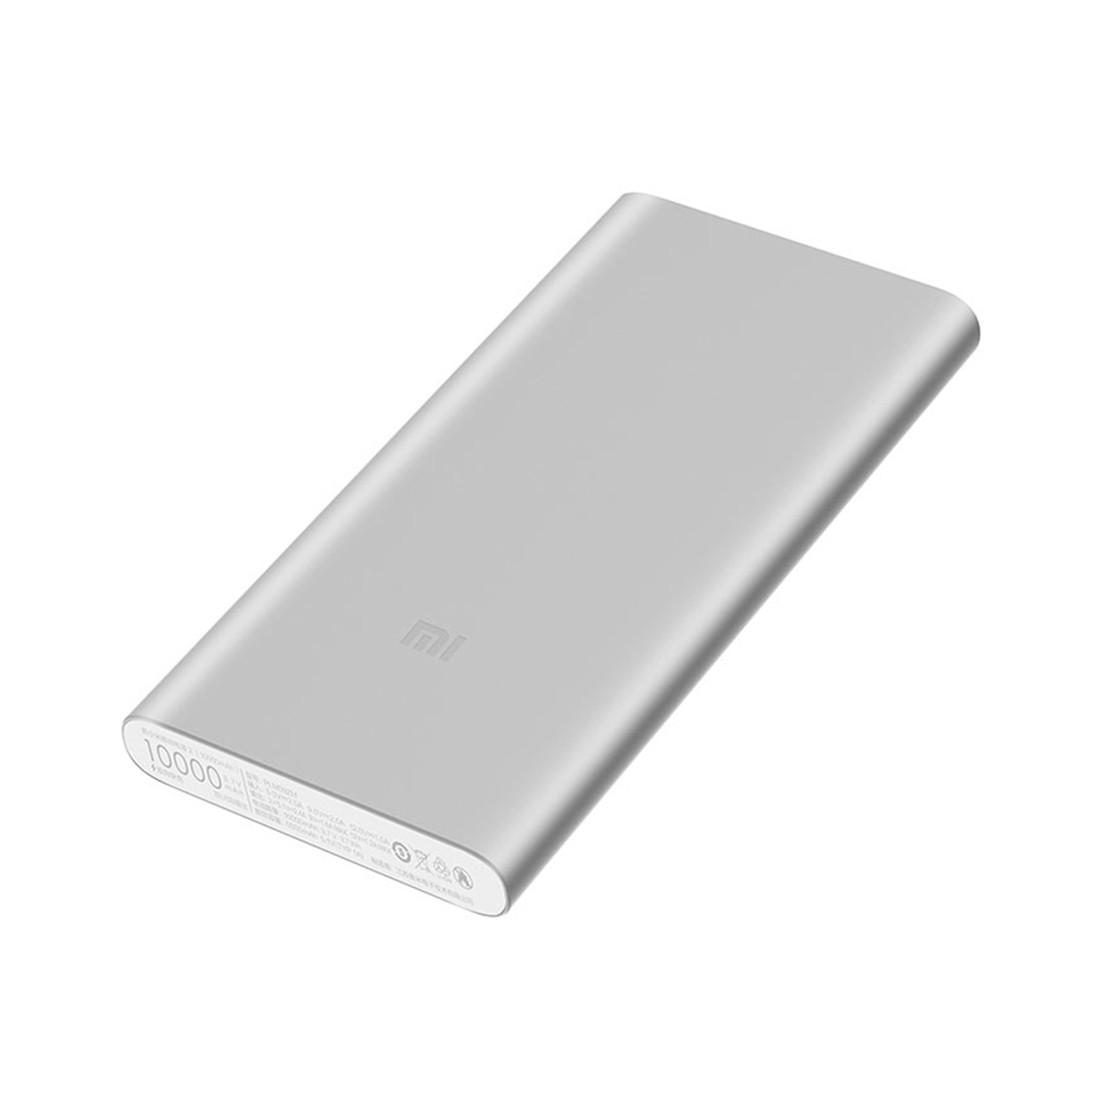 Портативное зарядное устройство Xiaomi Mi Power Bank 10000mAh,Серебристый